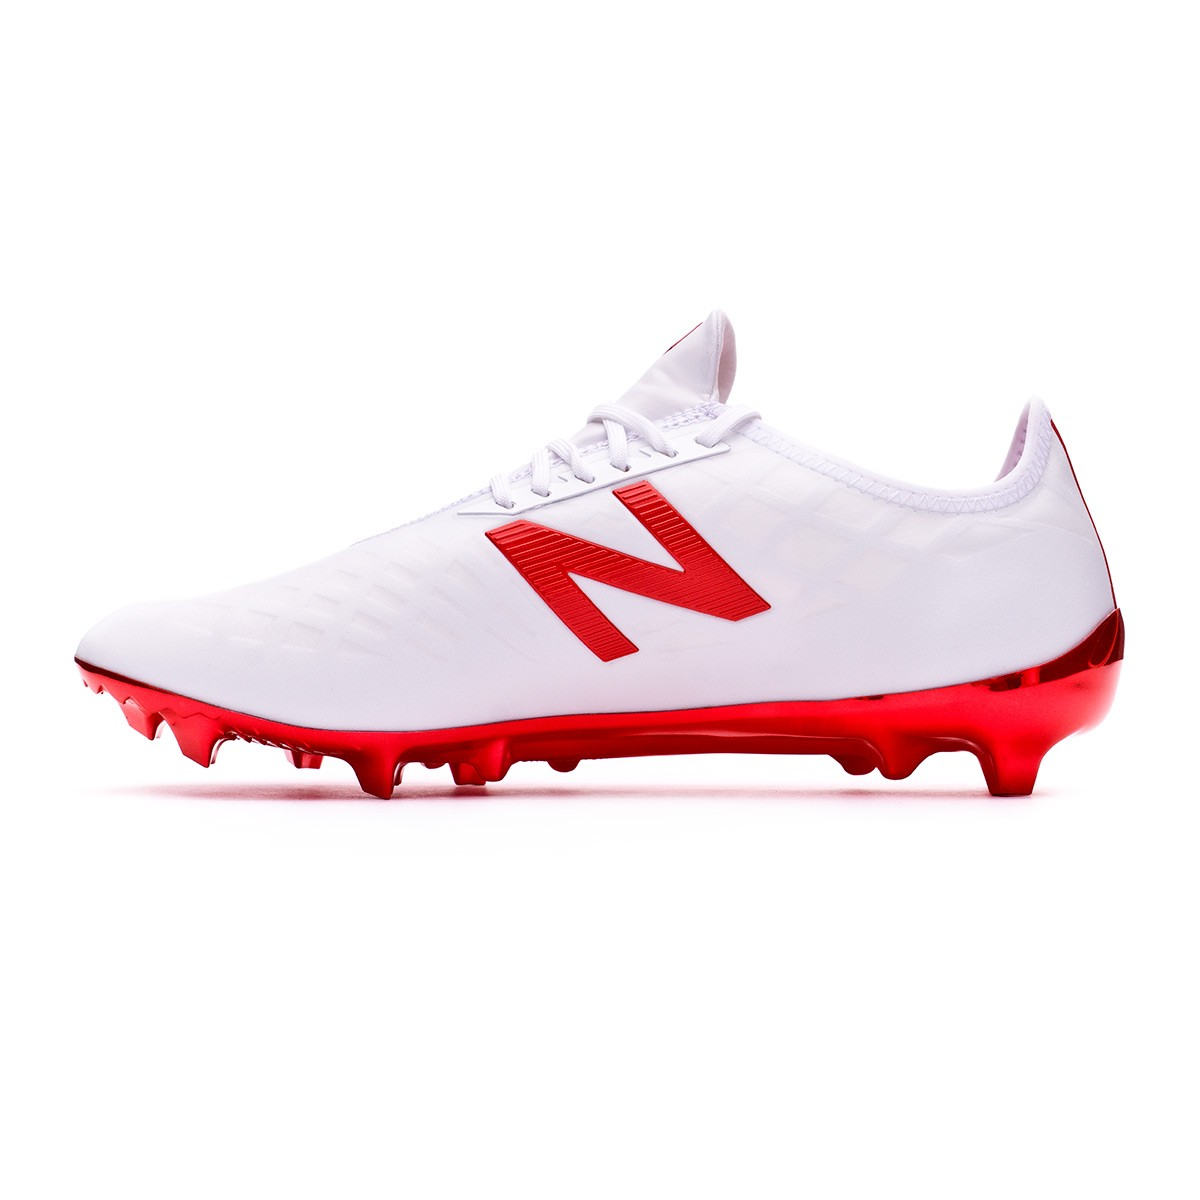 dd6907c55fb0 Football Boots New Balance Furon PRO FG White-Red - Tienda de fútbol Fútbol  Emotion